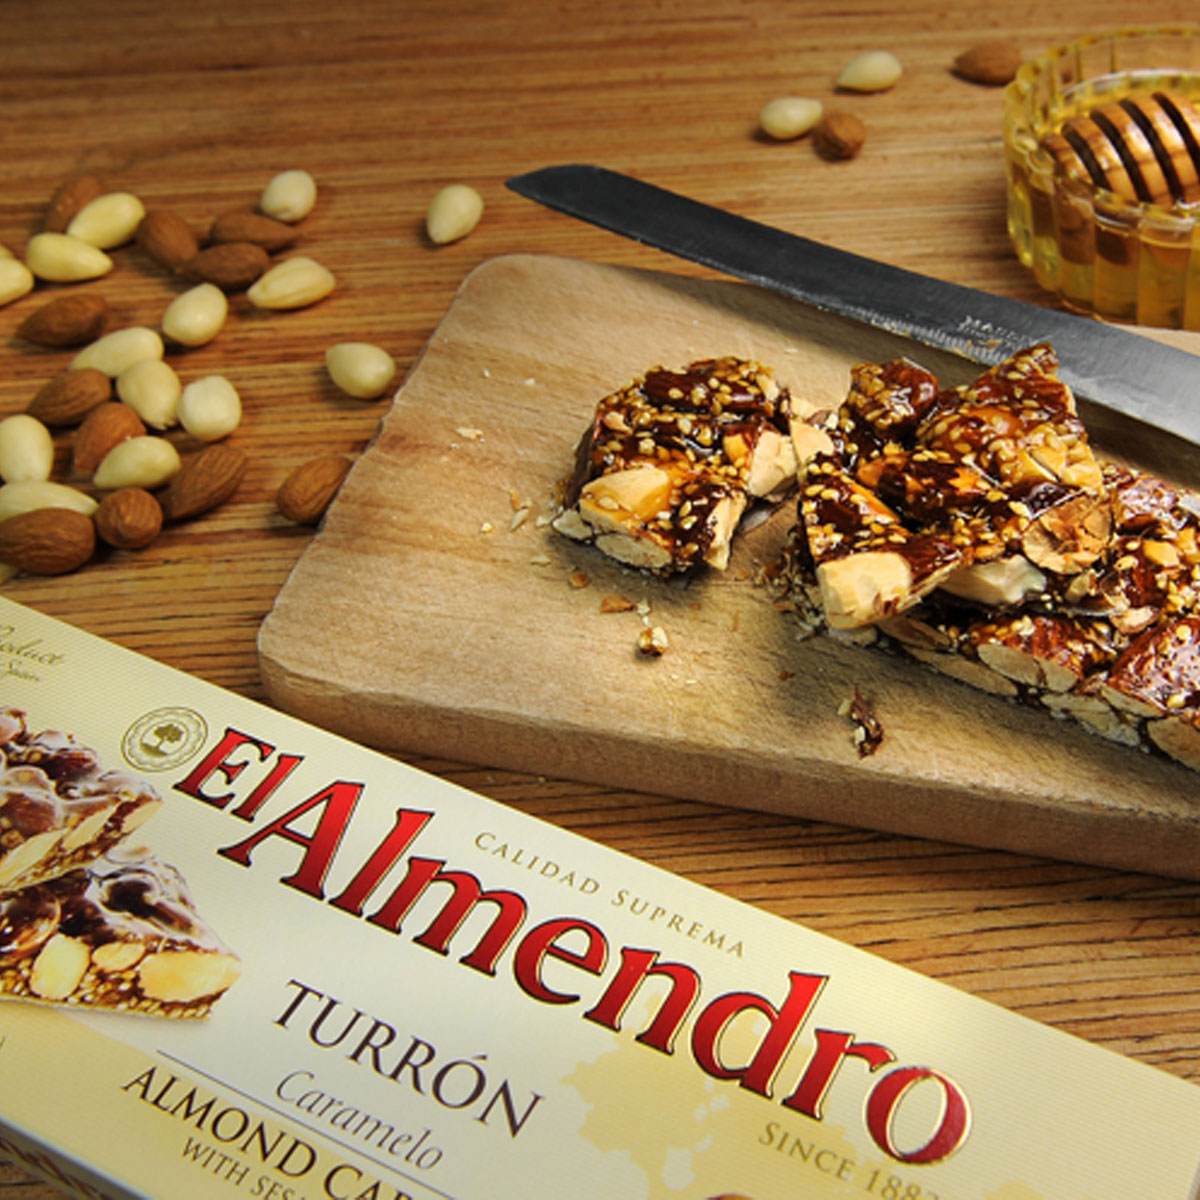 Top Food Feinkost - El Almendro Turrón Caramelo mit Sesam